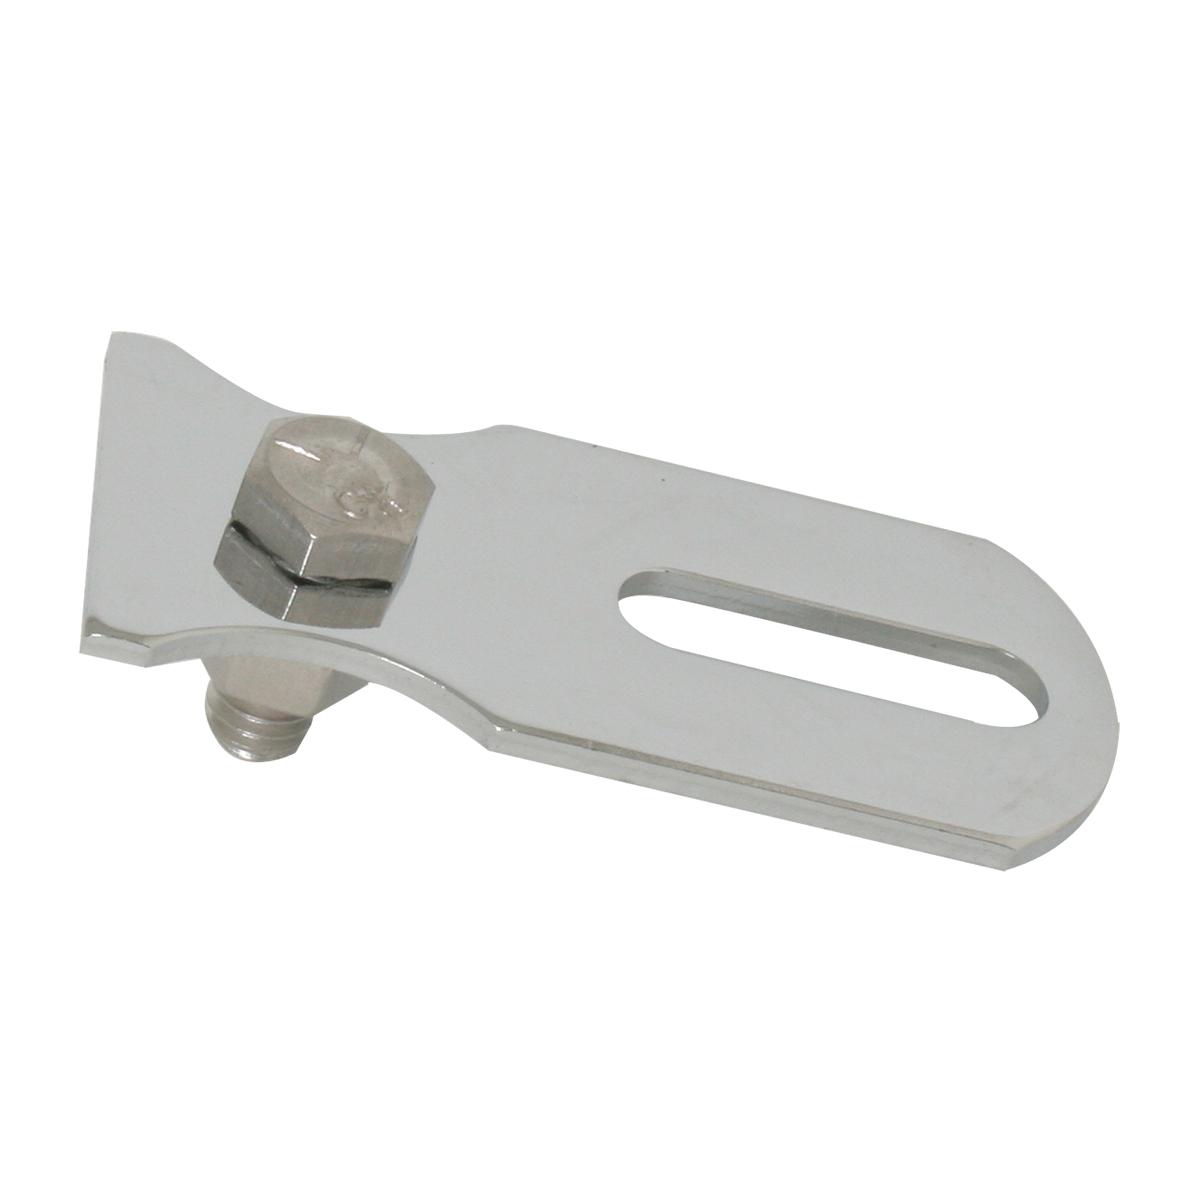 33162 Adapter Bracket for Mirror